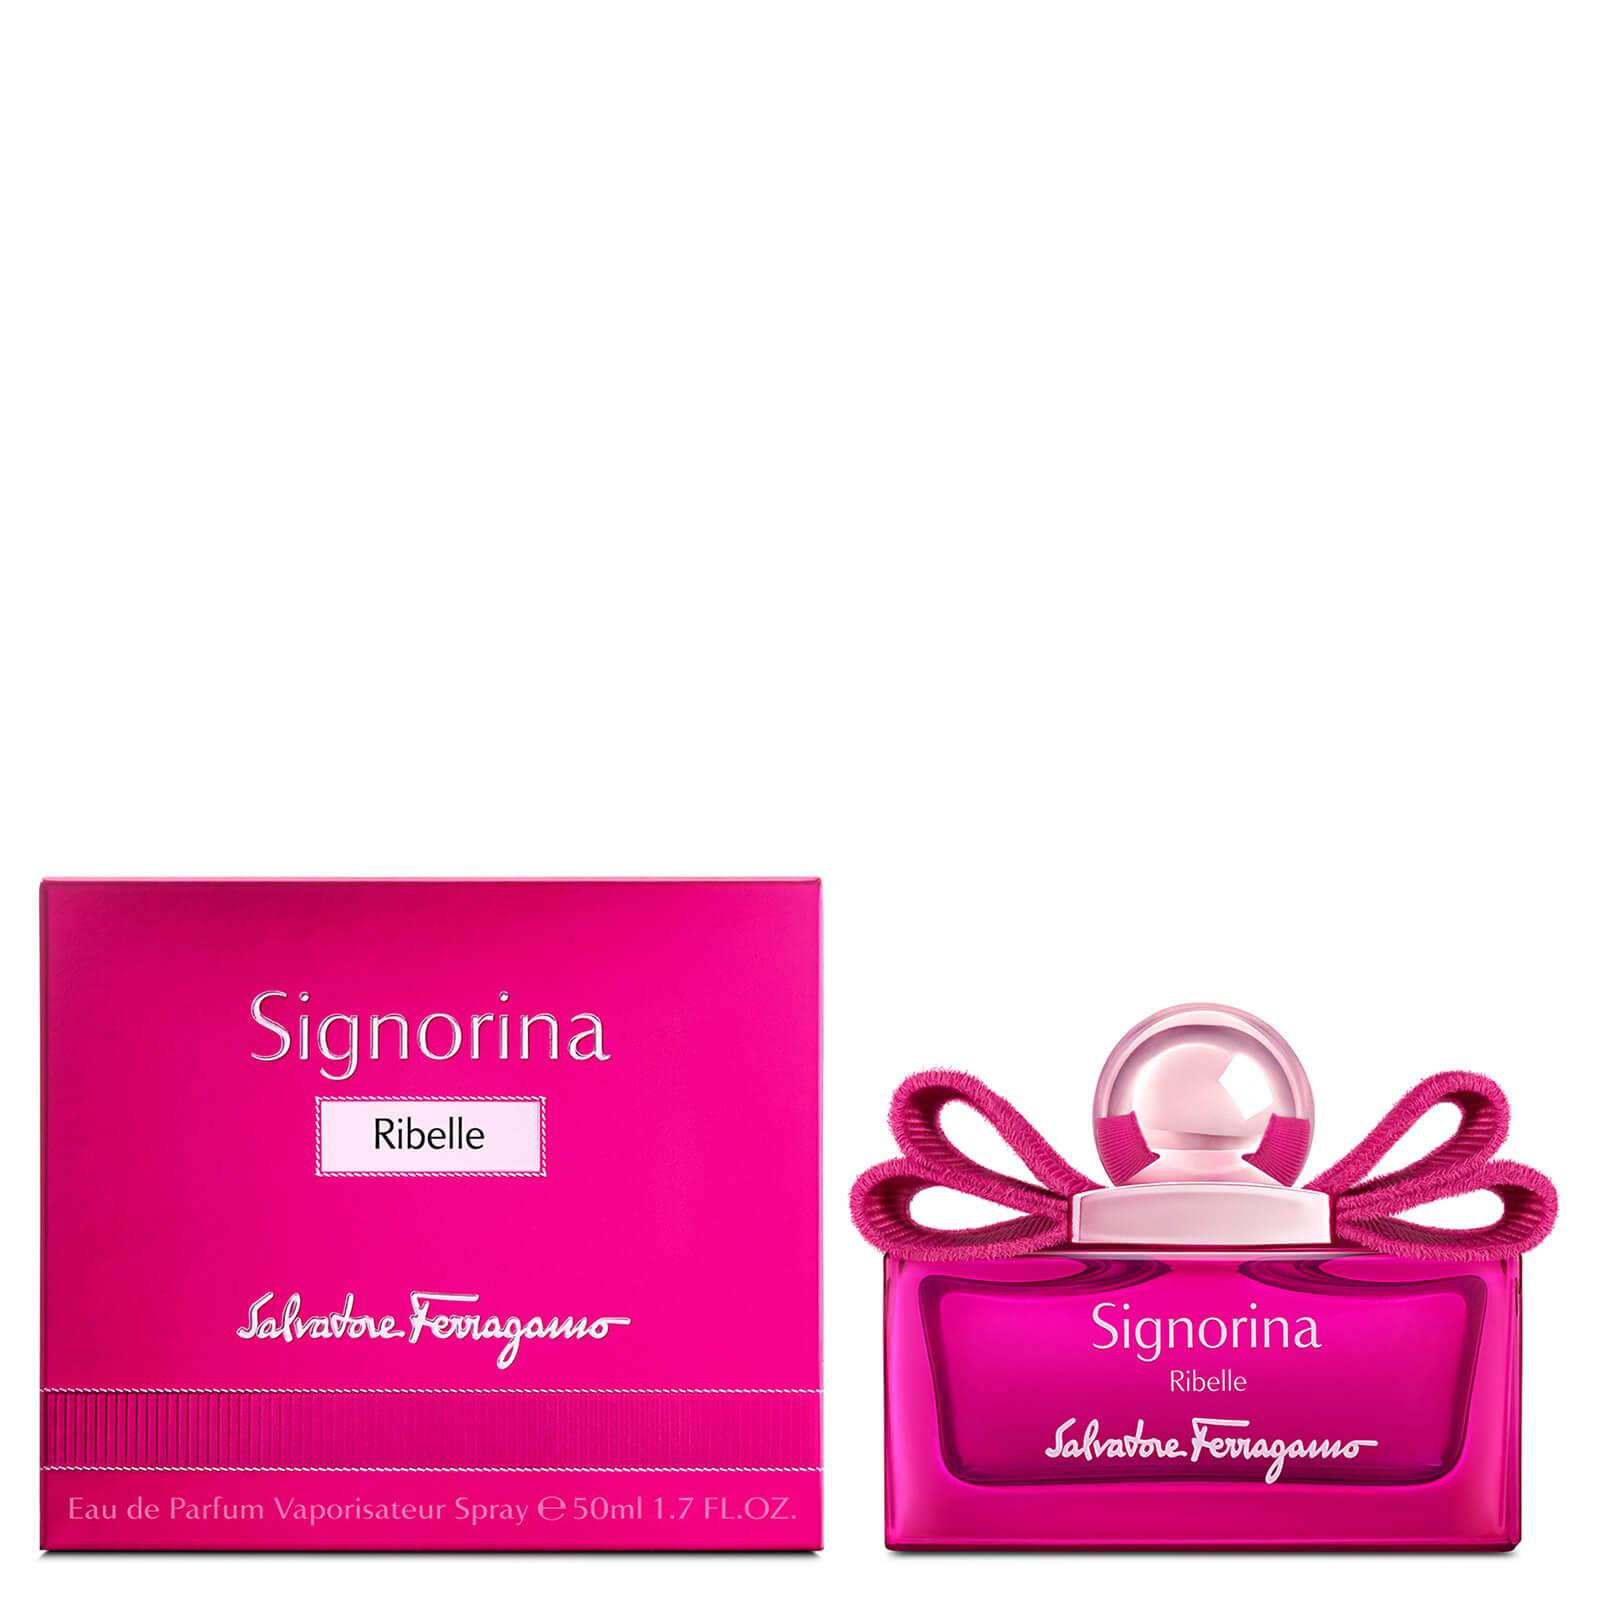 Salvatore Ferragamo Signorina Ribelle Eau de Parfum Vapo 50ml